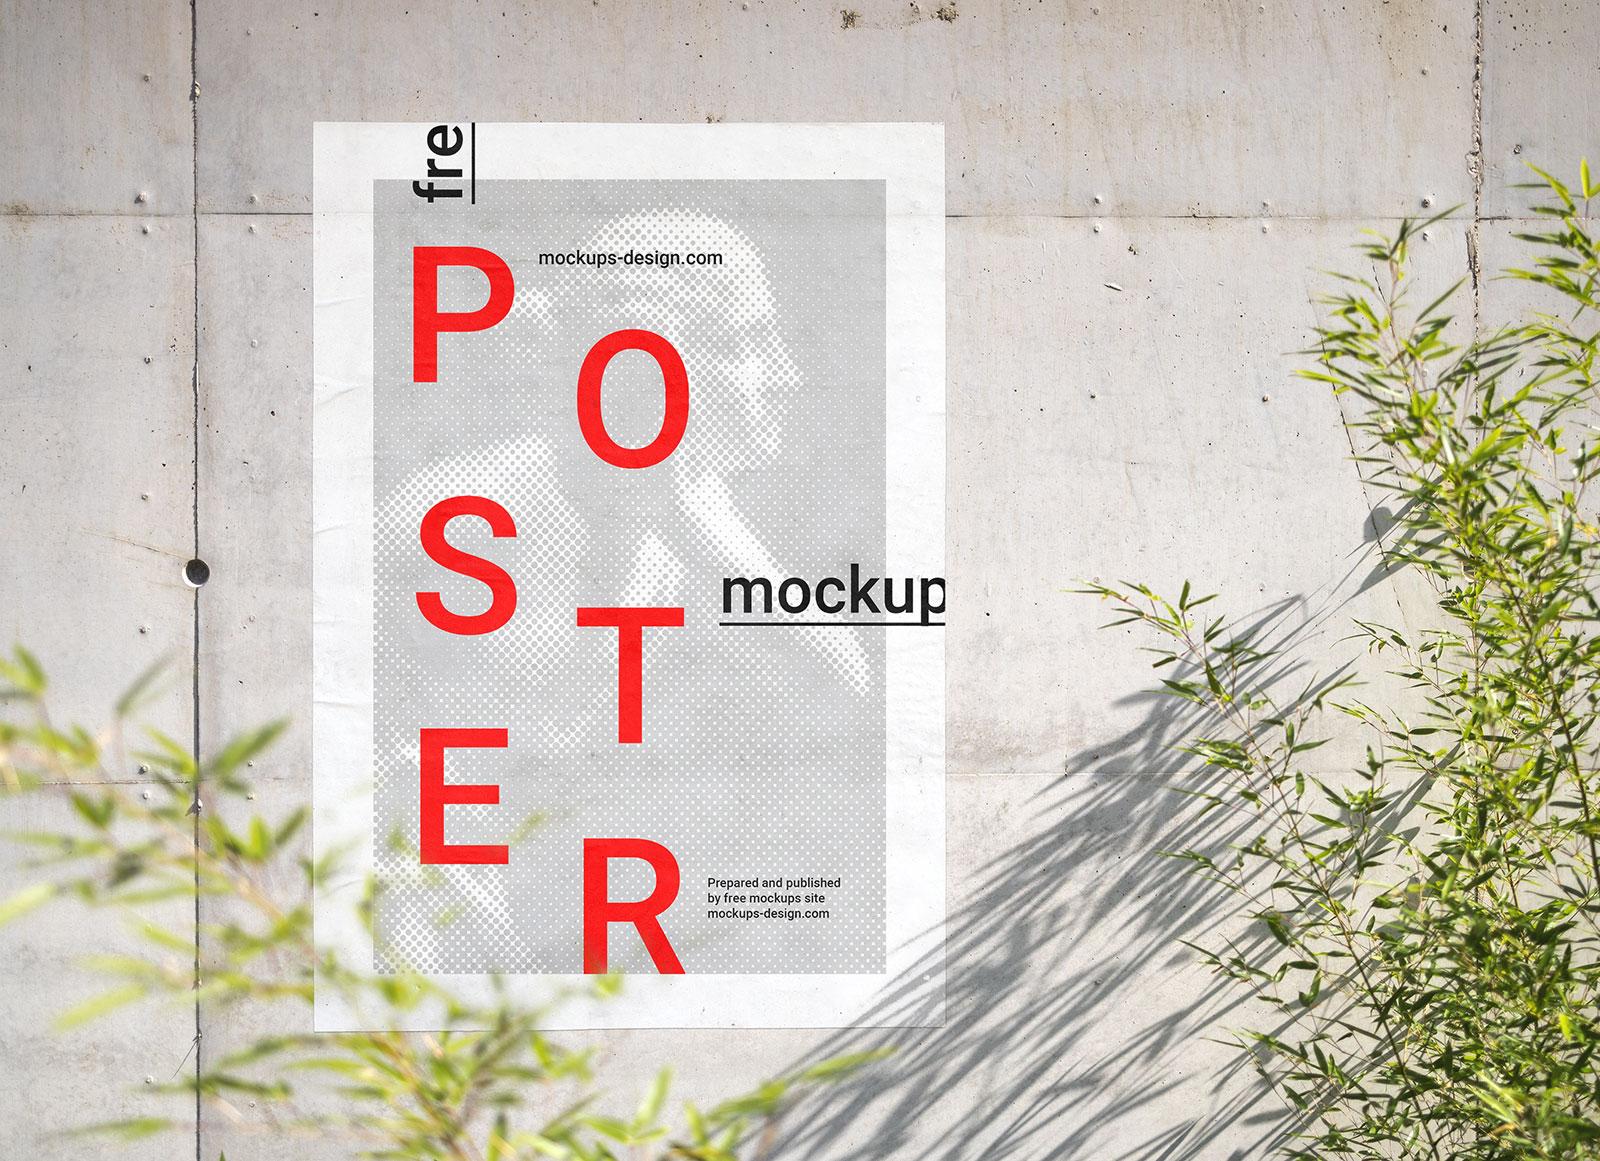 Free-Street-Wall-Poster-Mockup-PSD